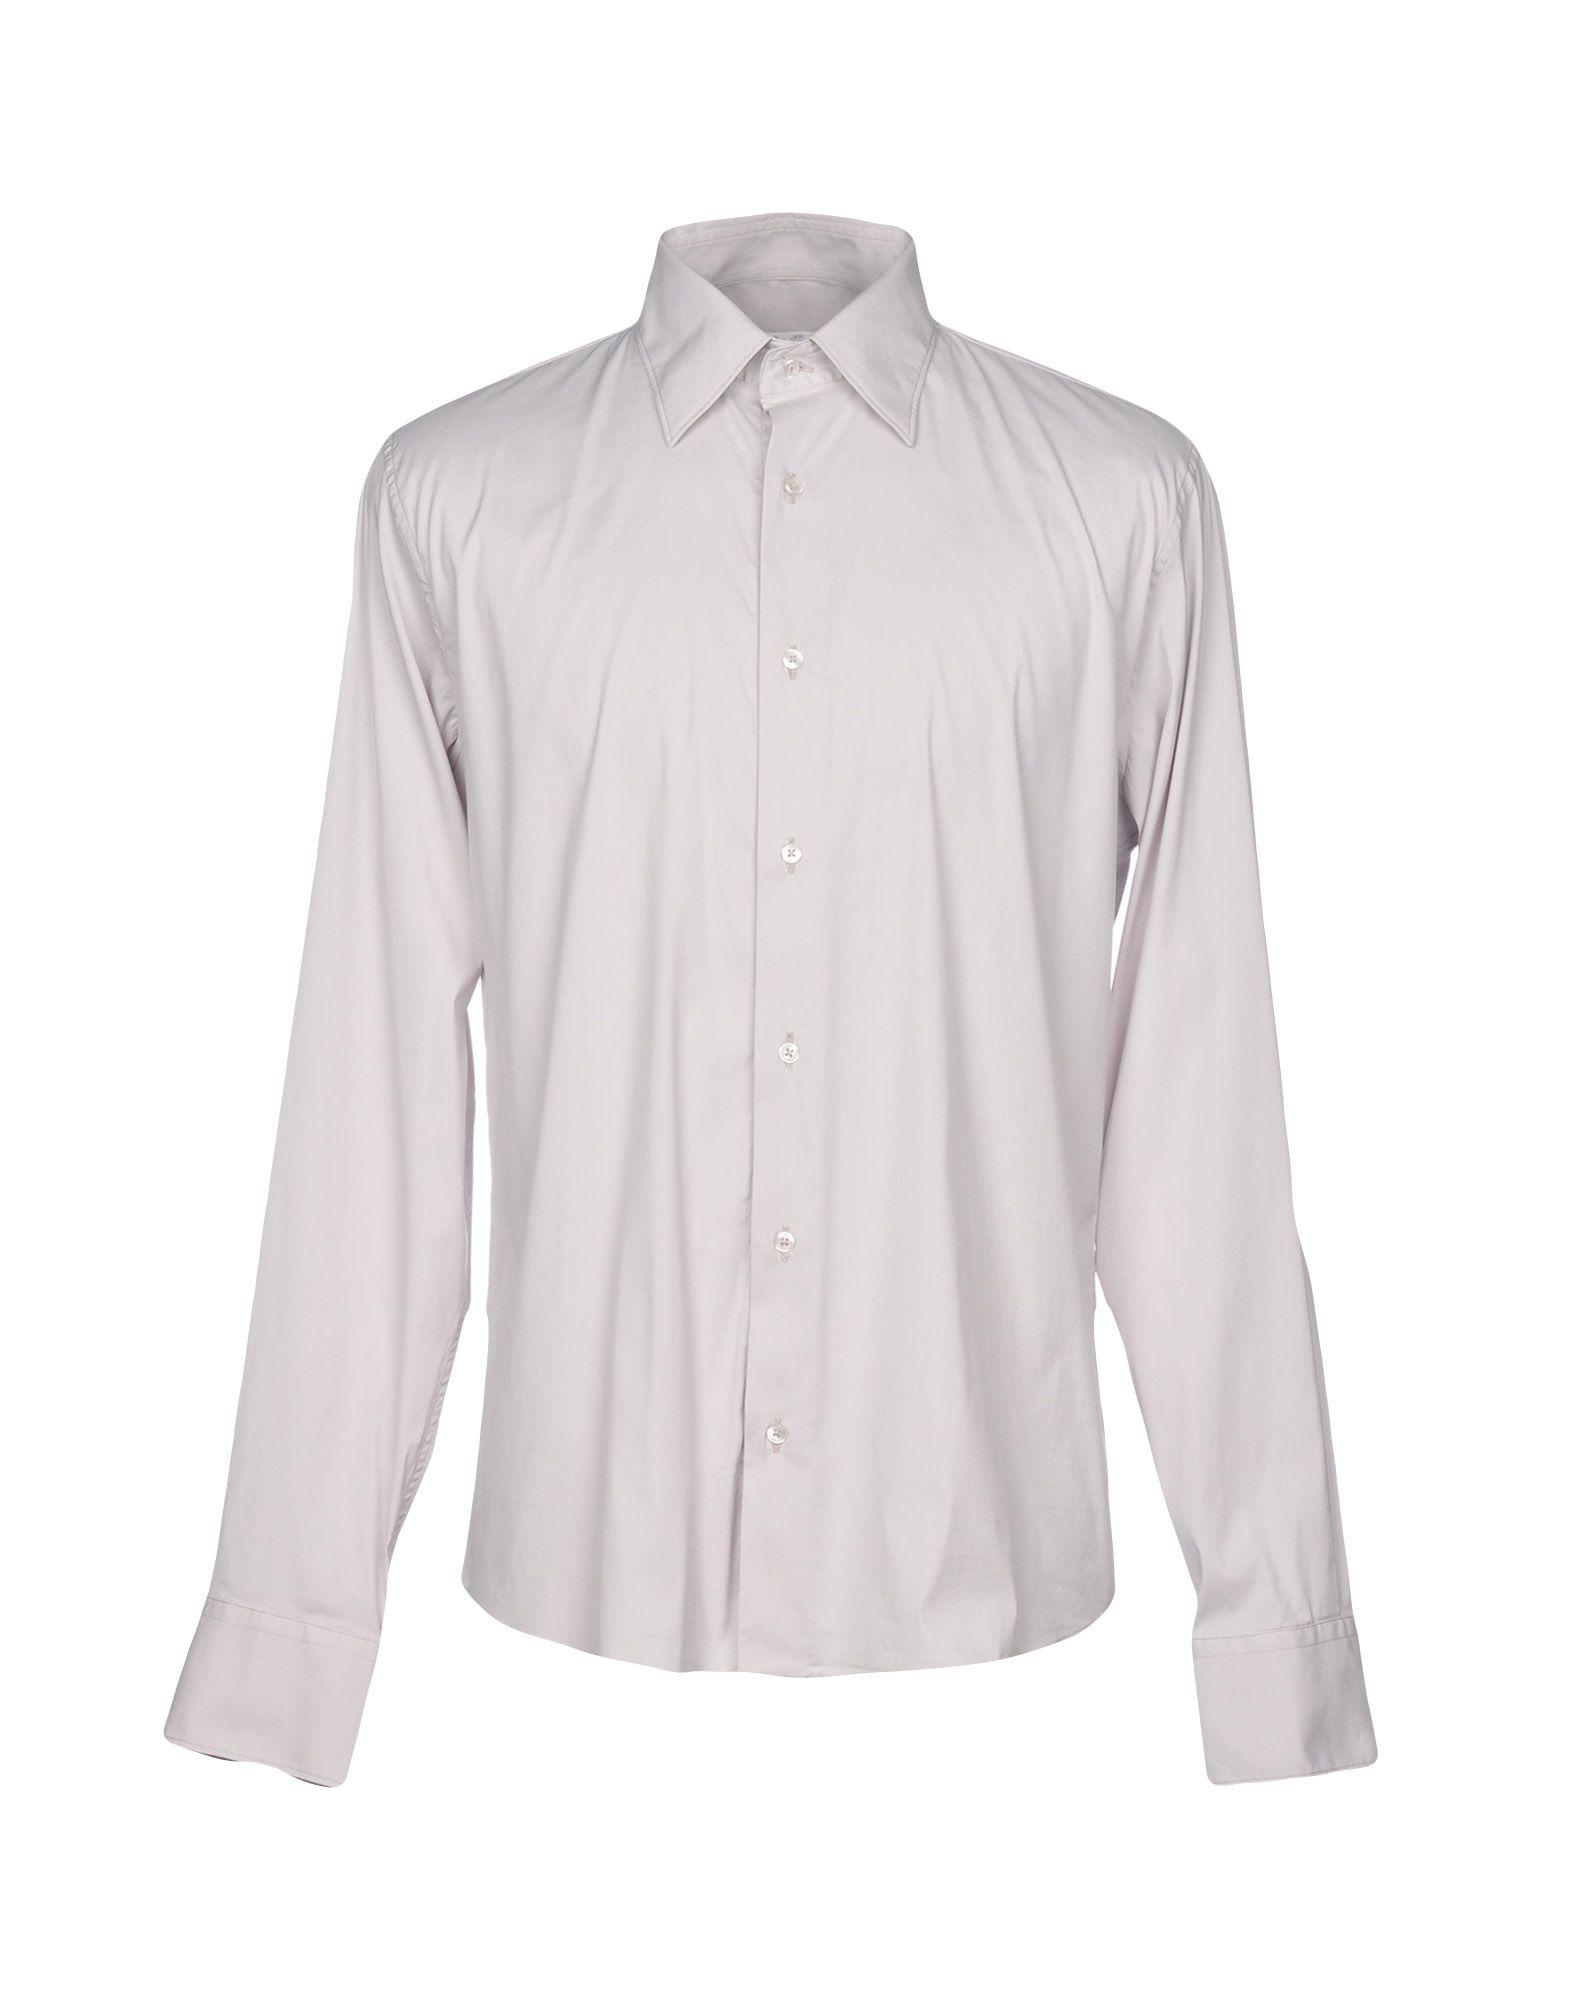 ROBERT FRIEDMAN Solid Color Shirt in Light Grey